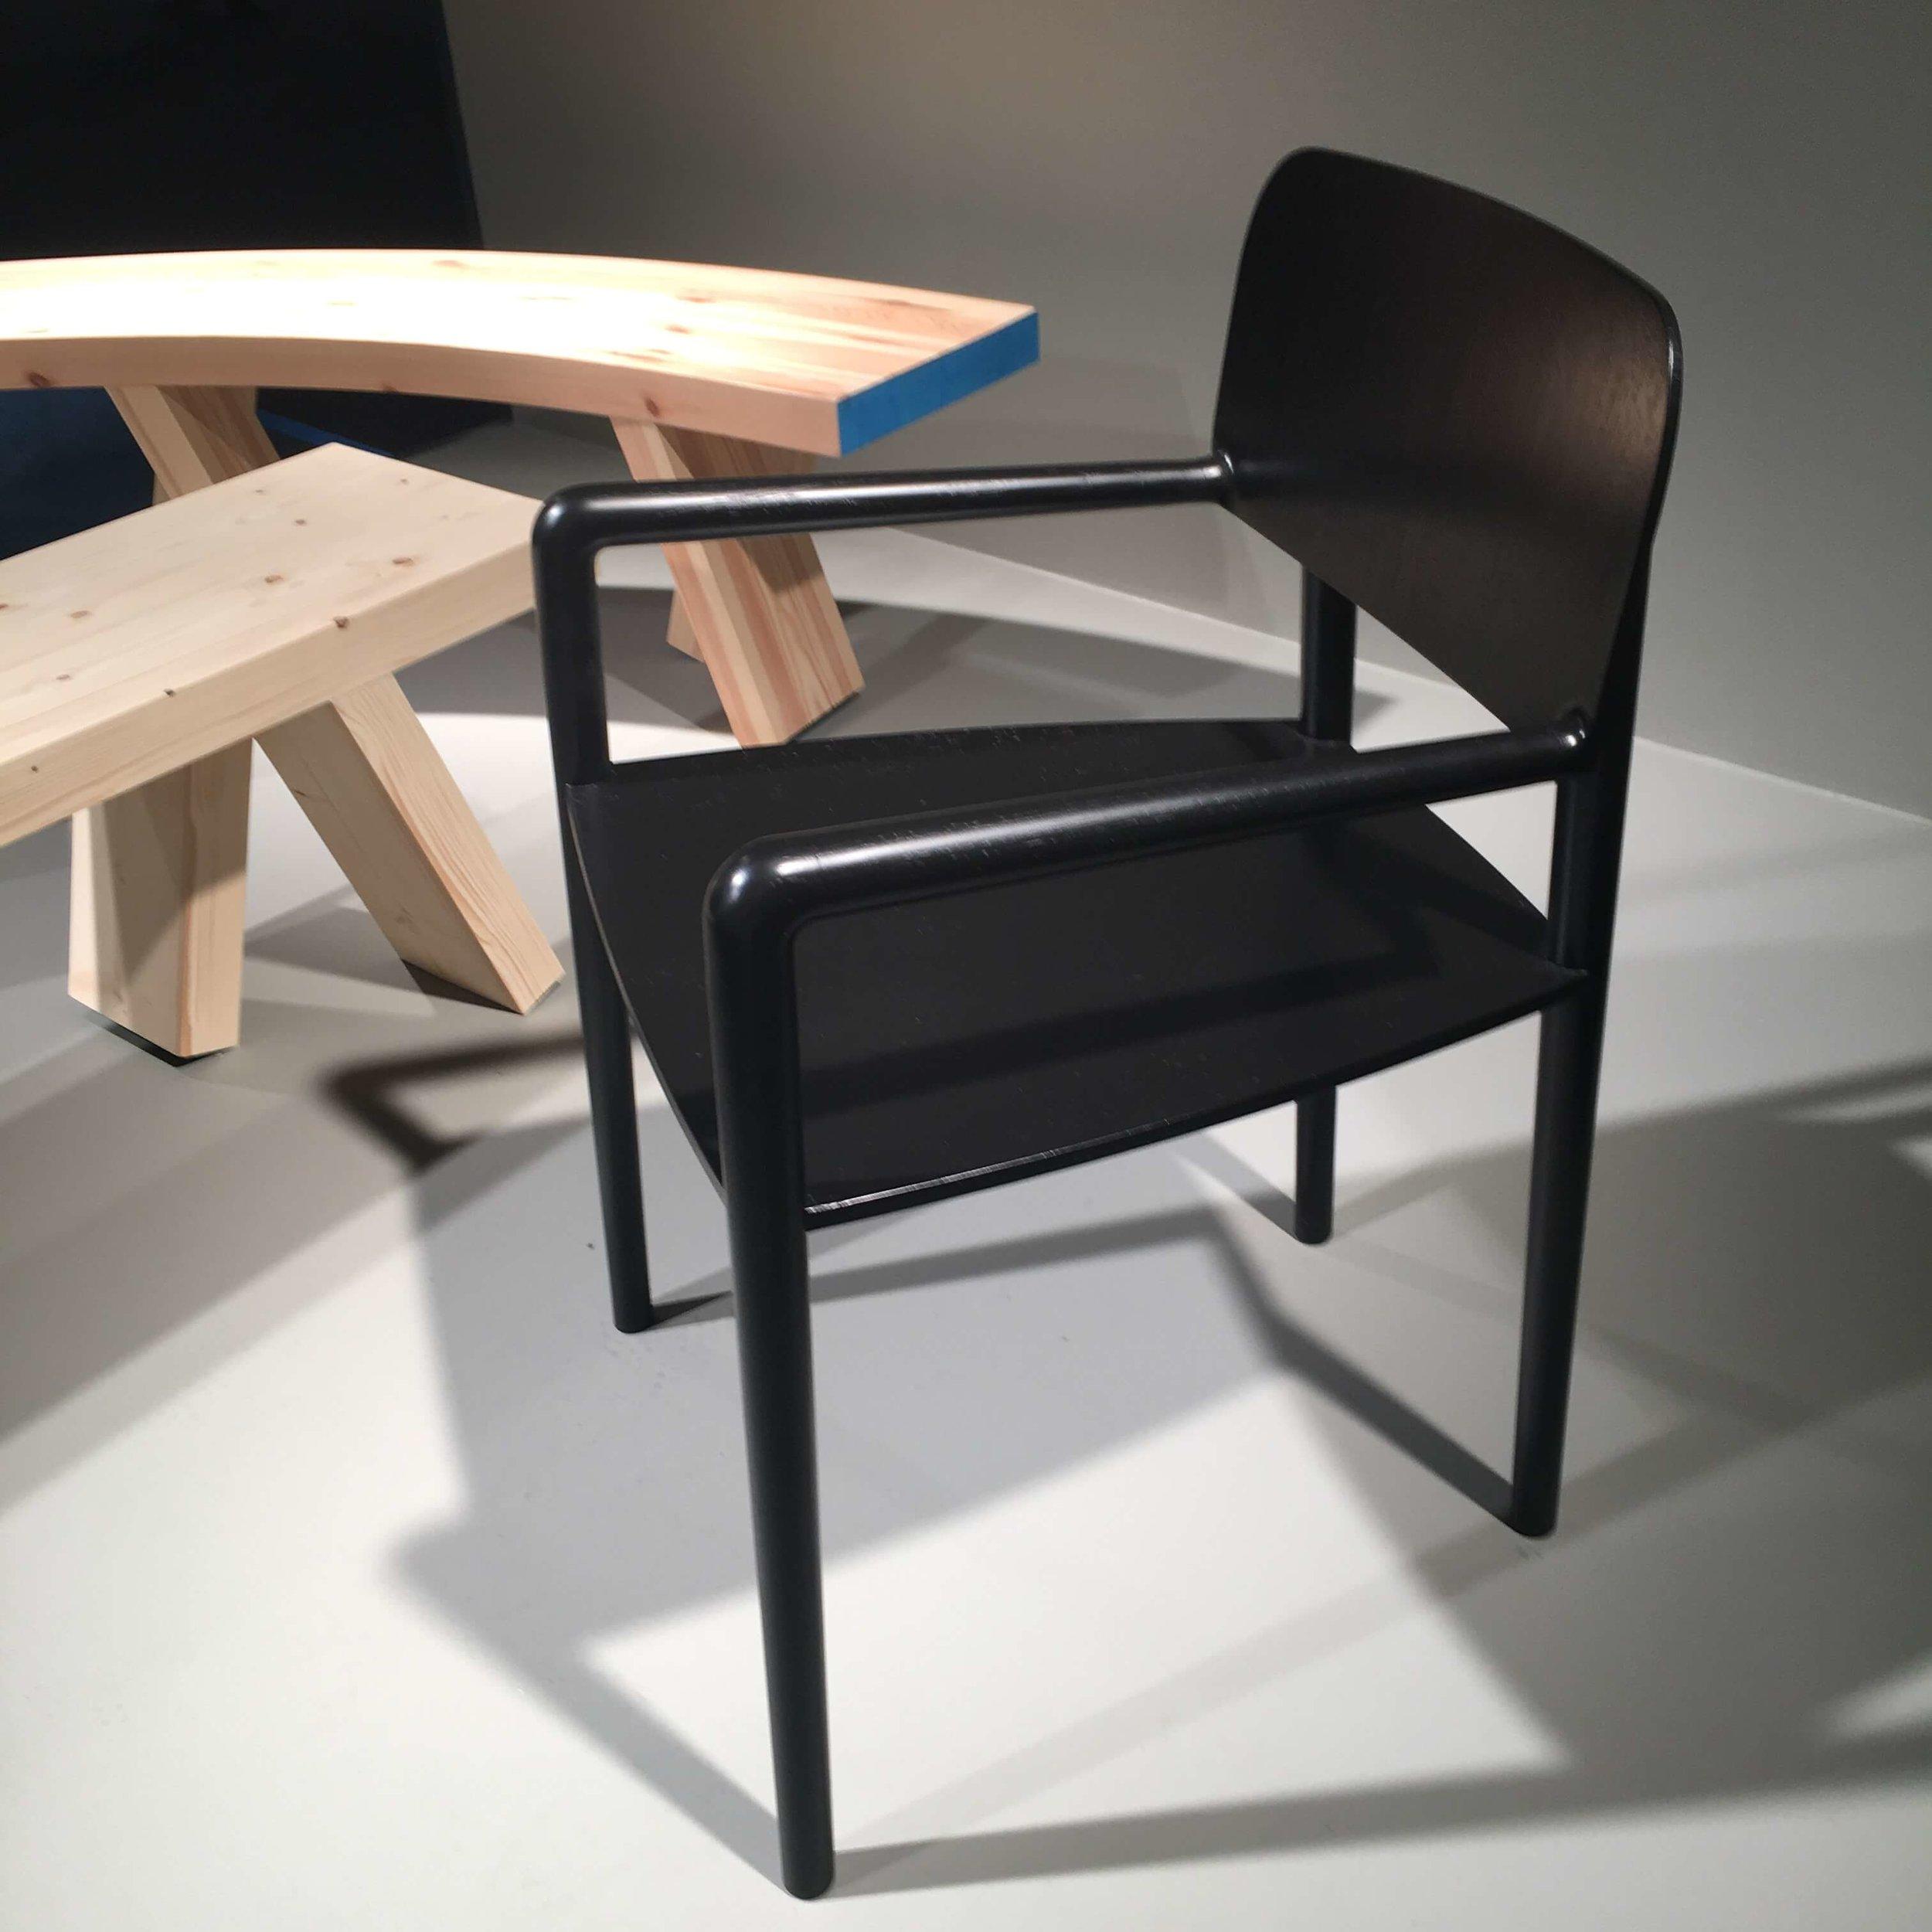 Mahu, Neuinterpretation des Designs aus den 60ern, Pure Talent Kevin Gerstmeier